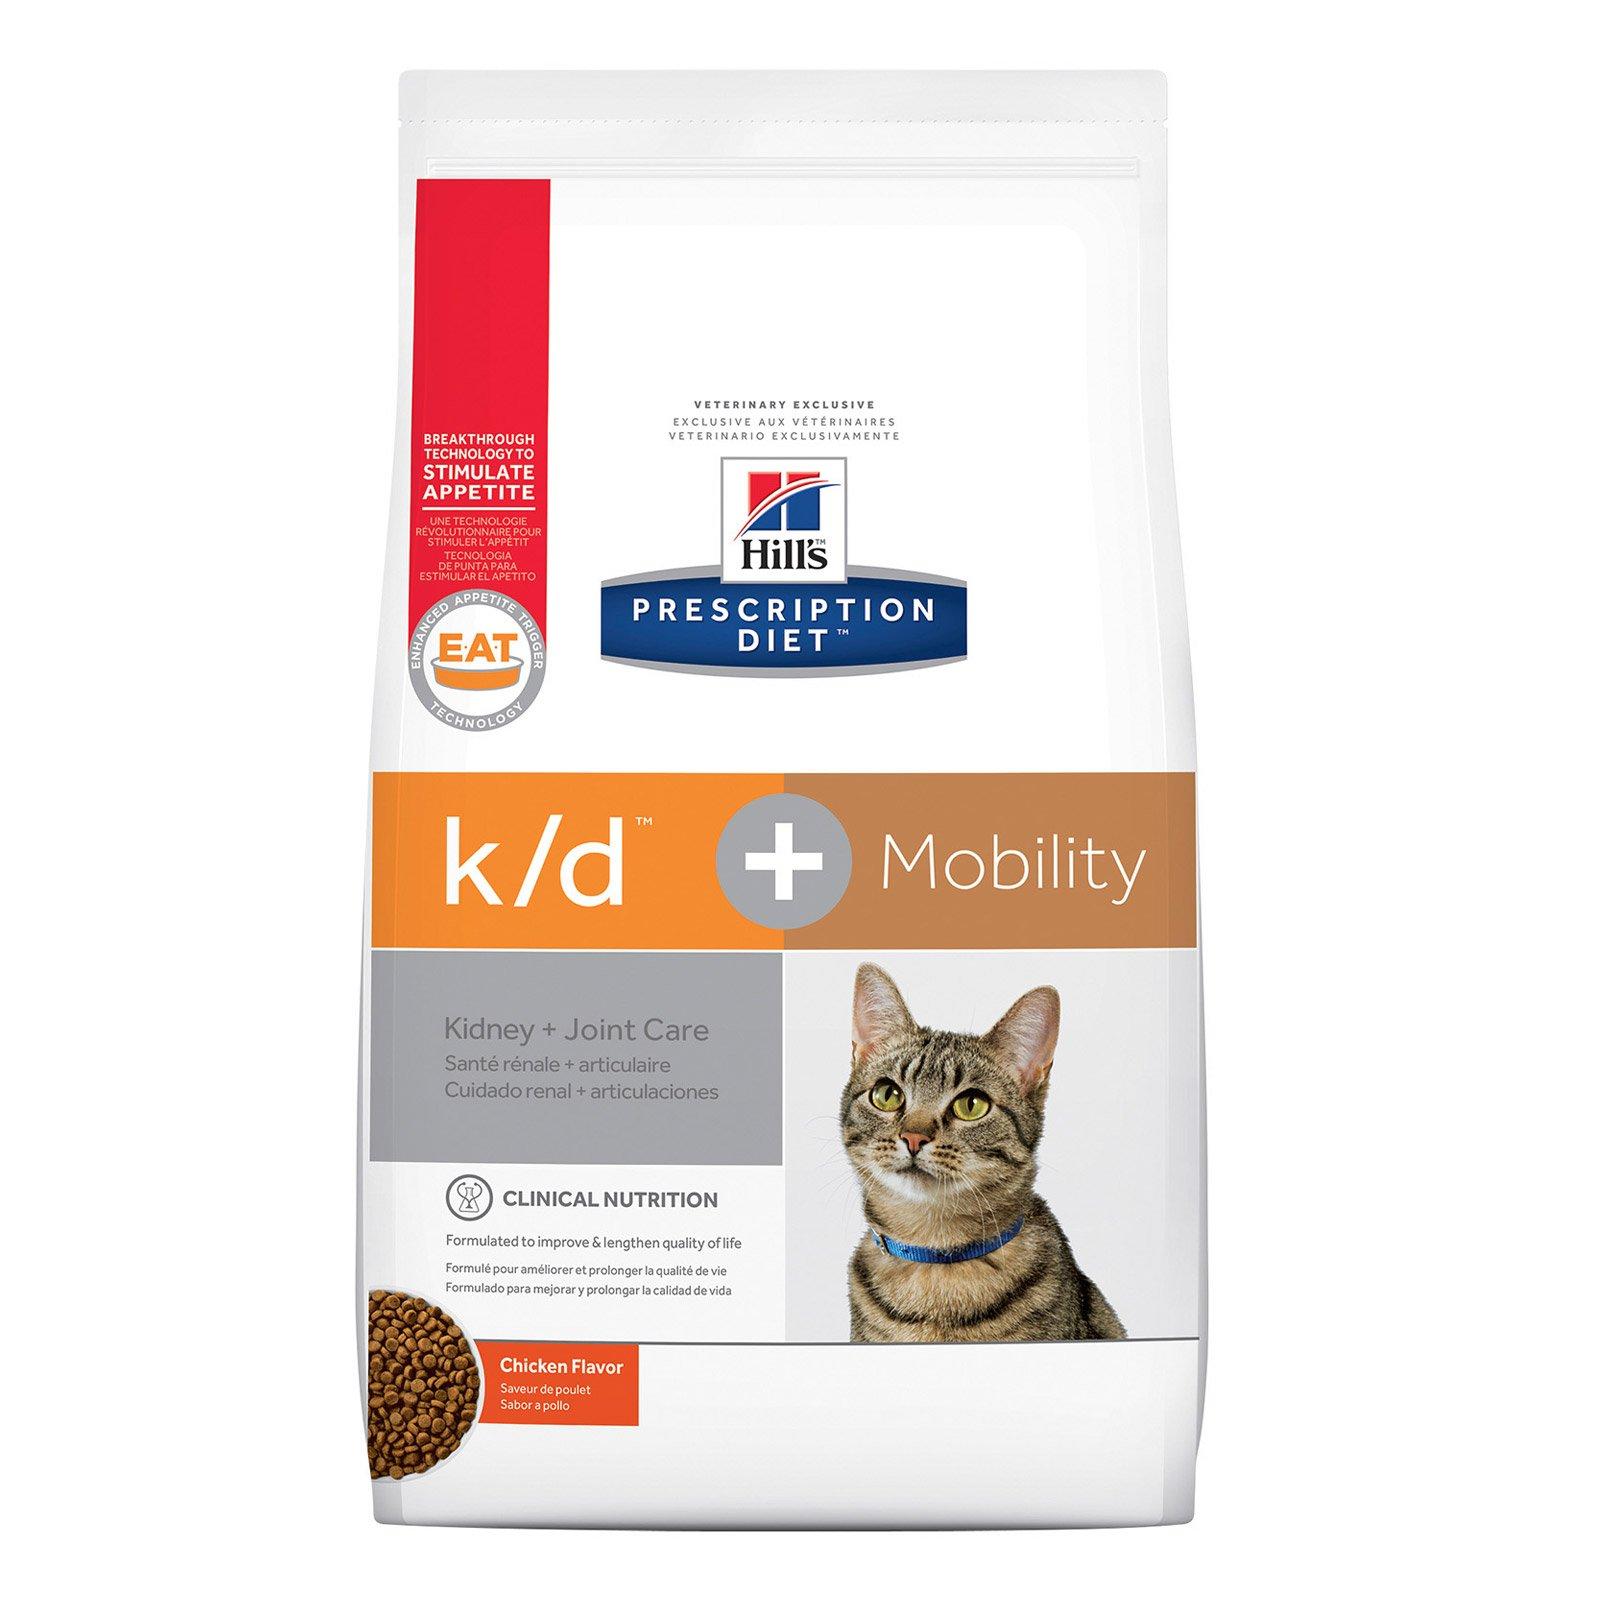 Hill's Prescription Diet k/d + Mobility Chicken Dry Cat Food